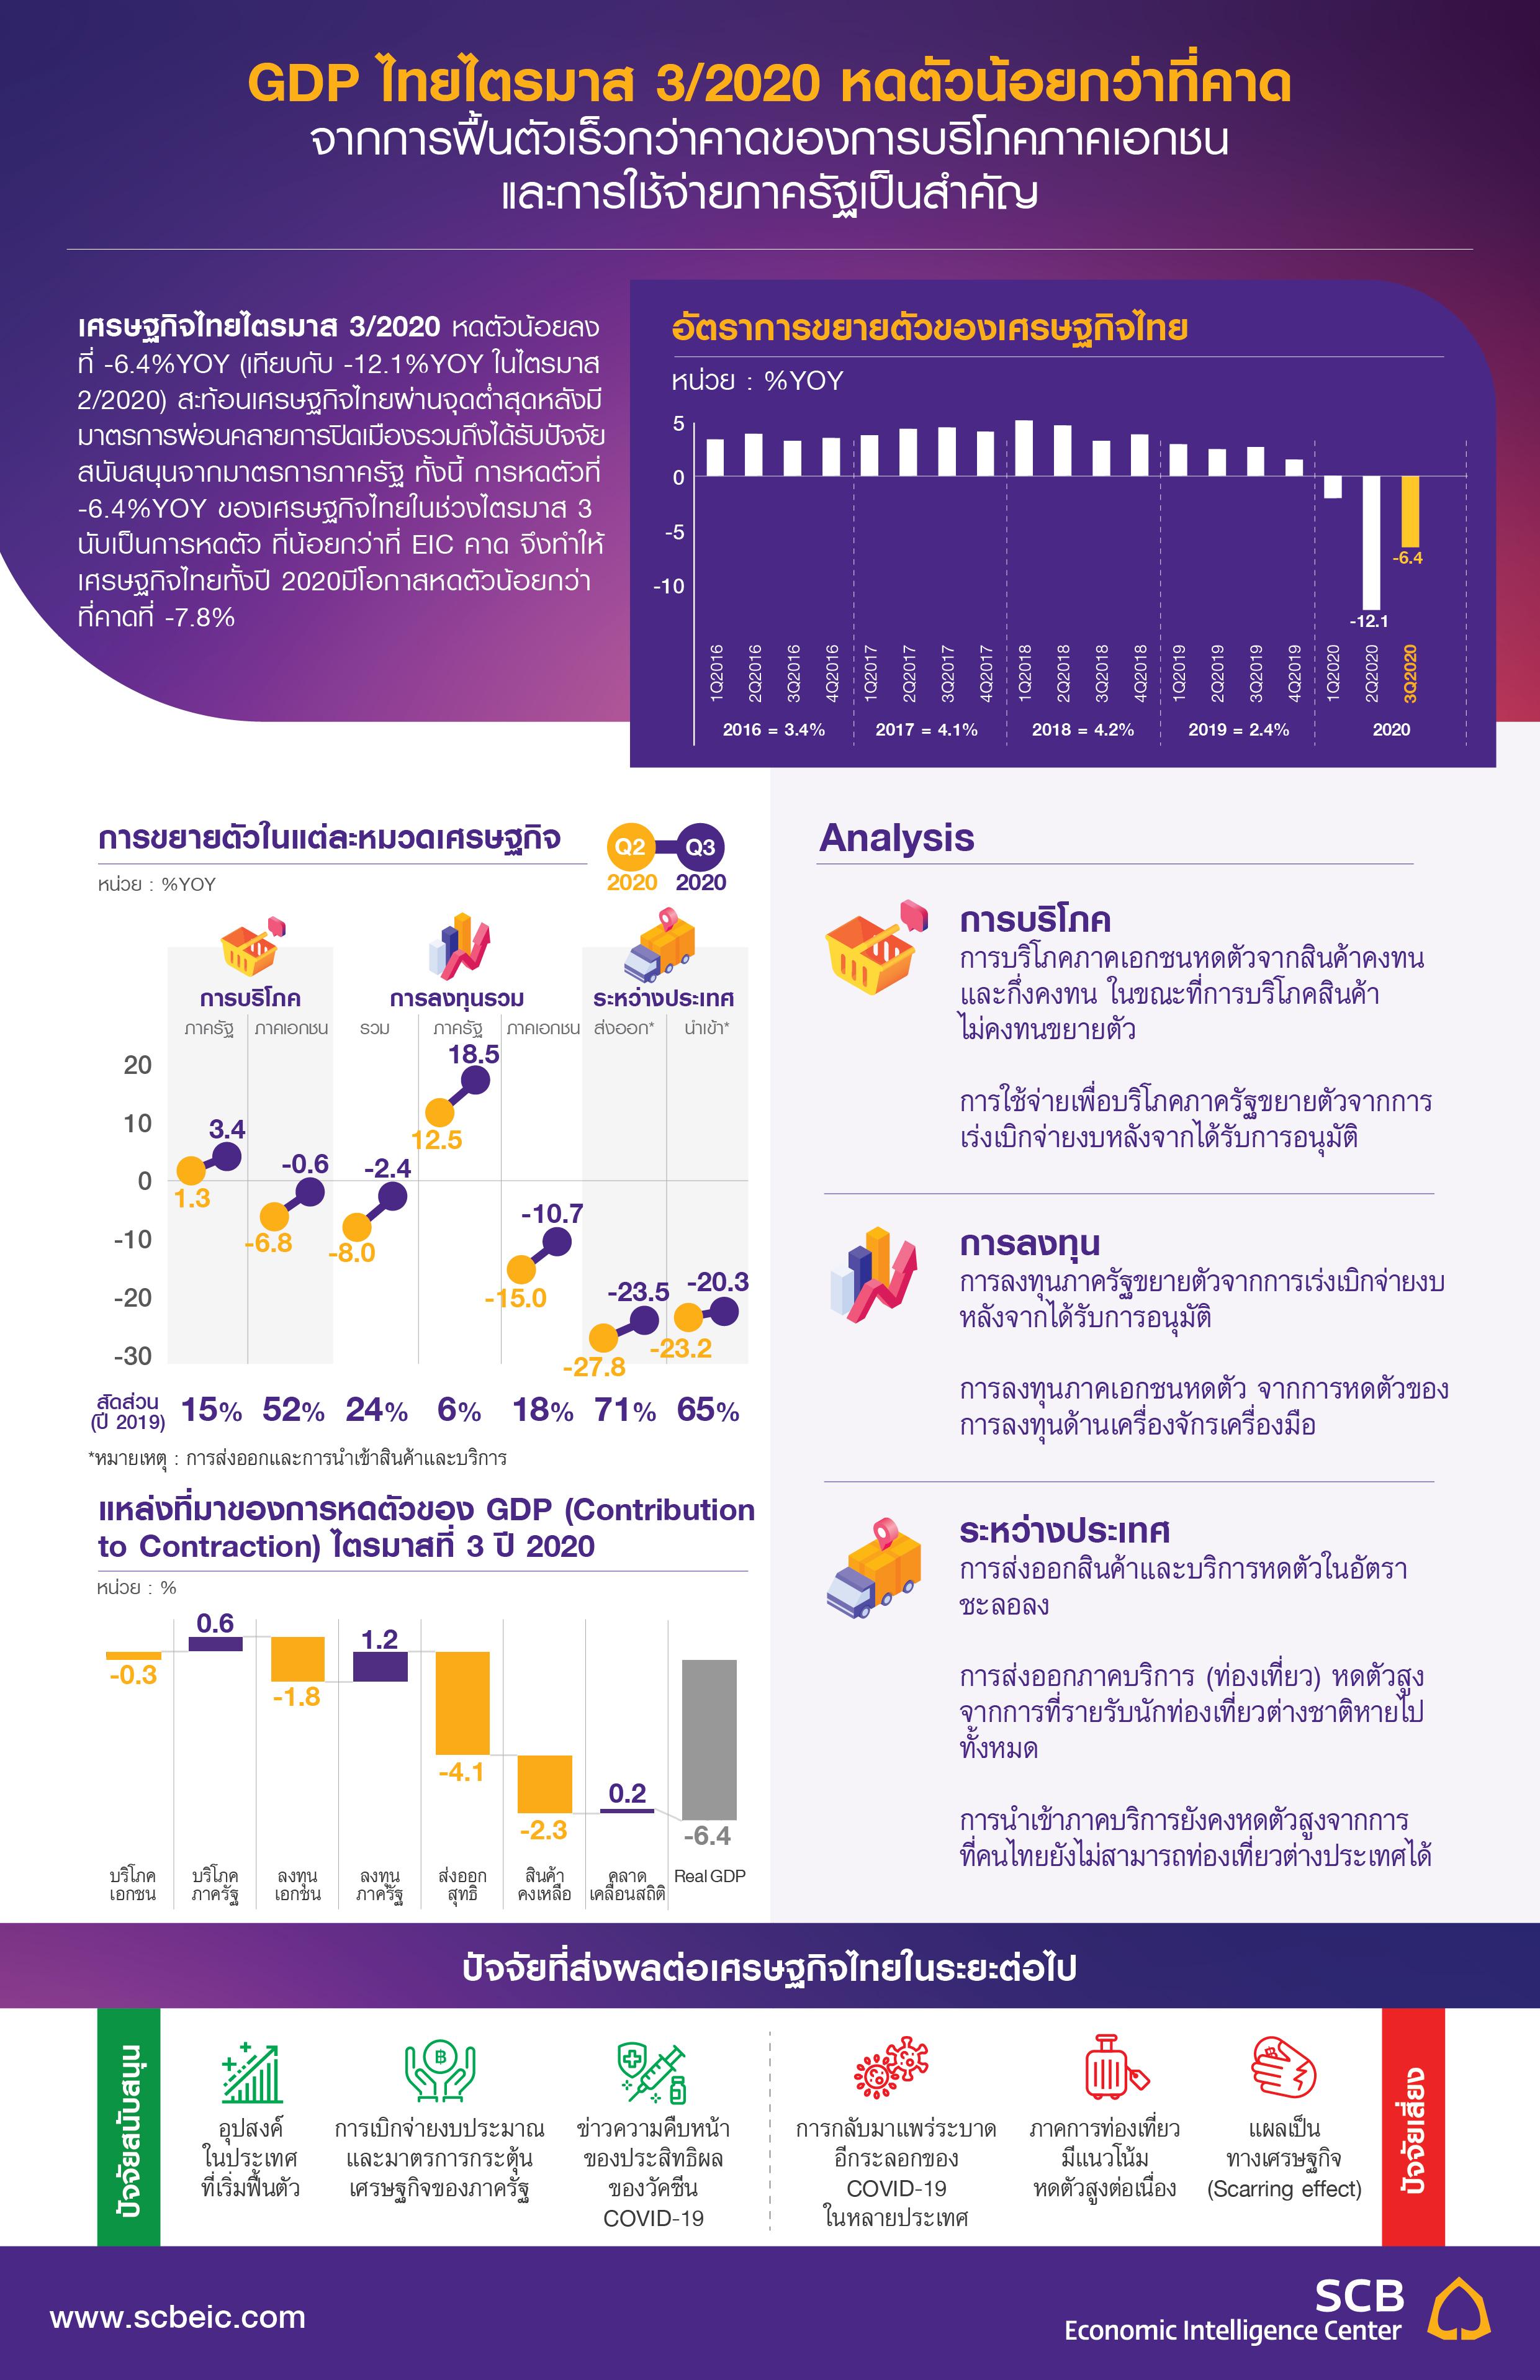 TH_Infographic_Flash_GDP_Q32020-01.jpg